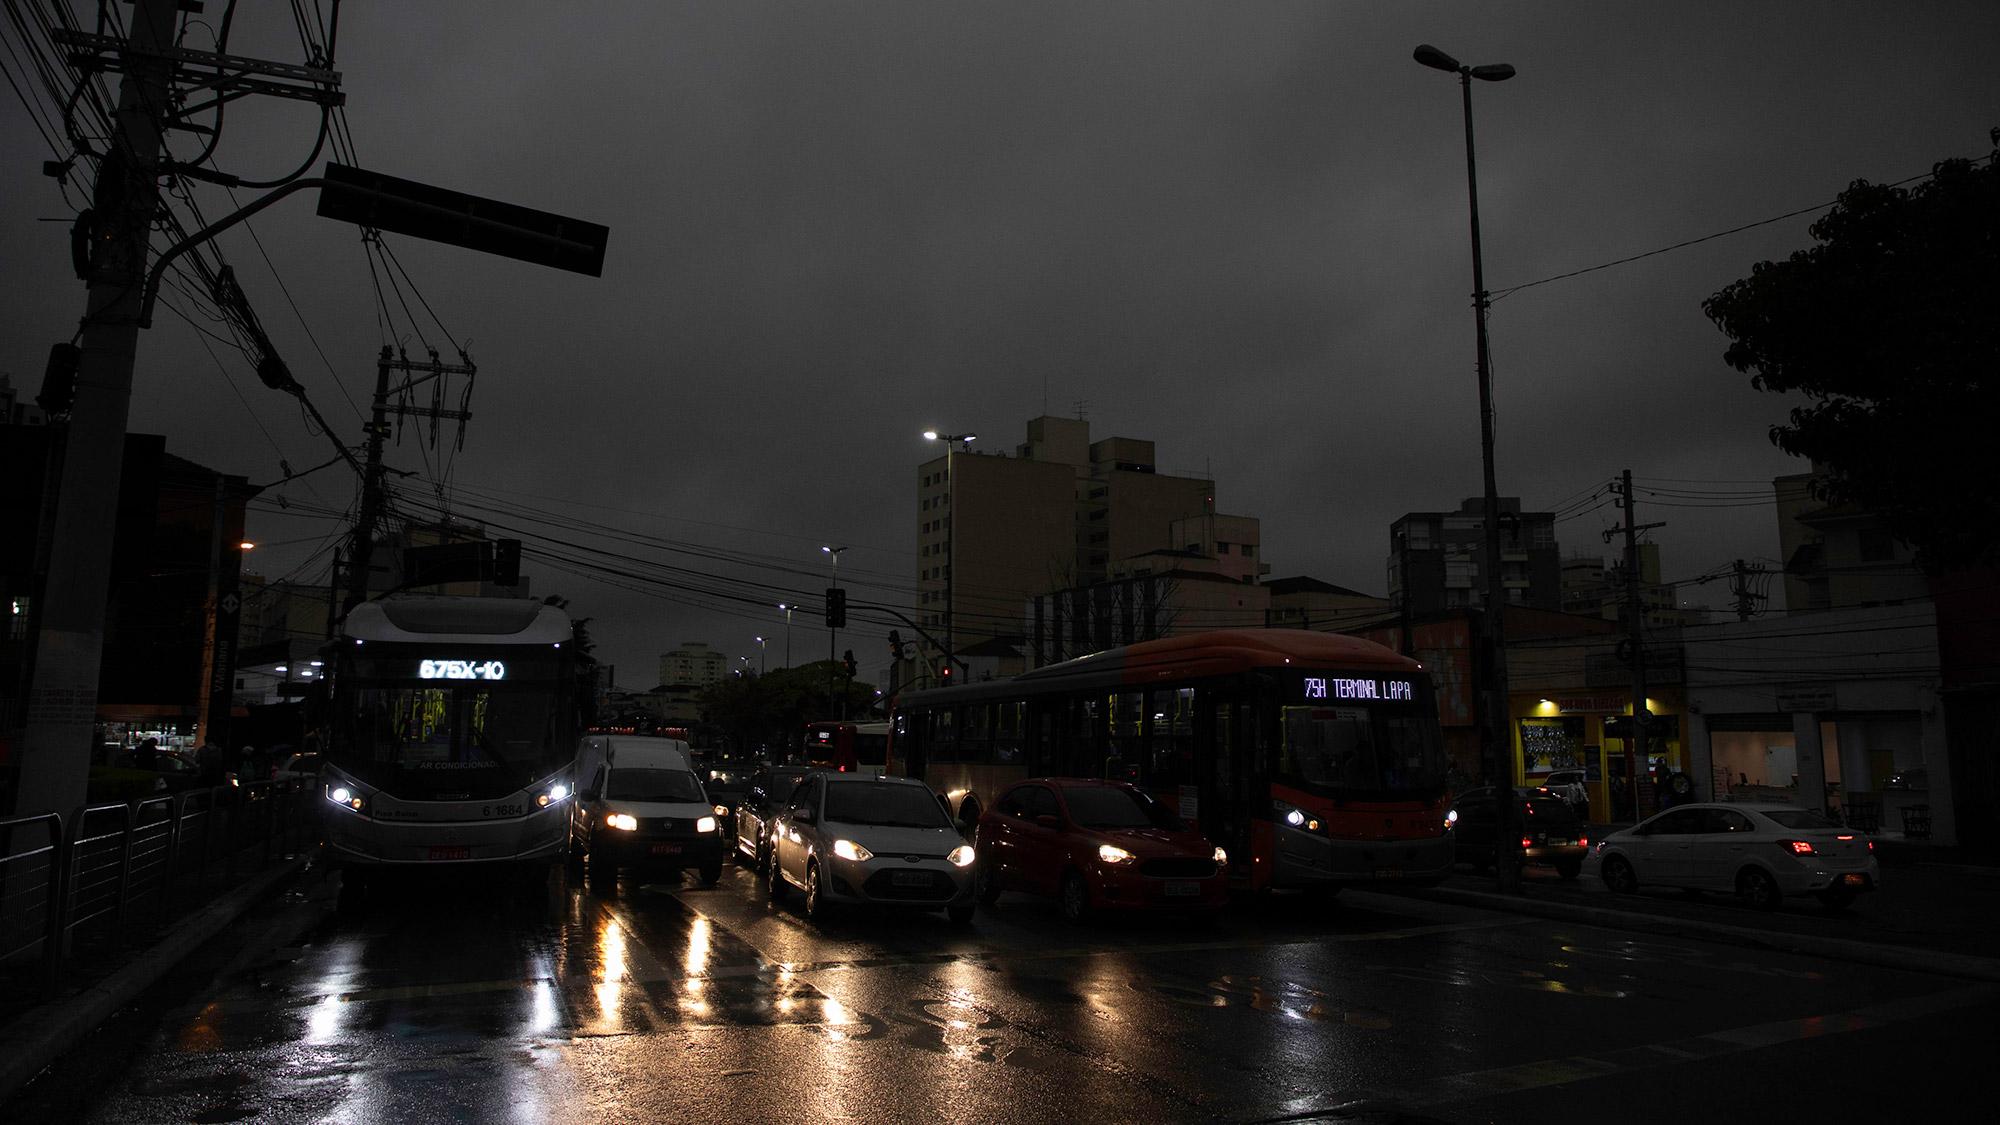 Smoke from Burning Amazon Turns São Paulo Afternoon into Midnight